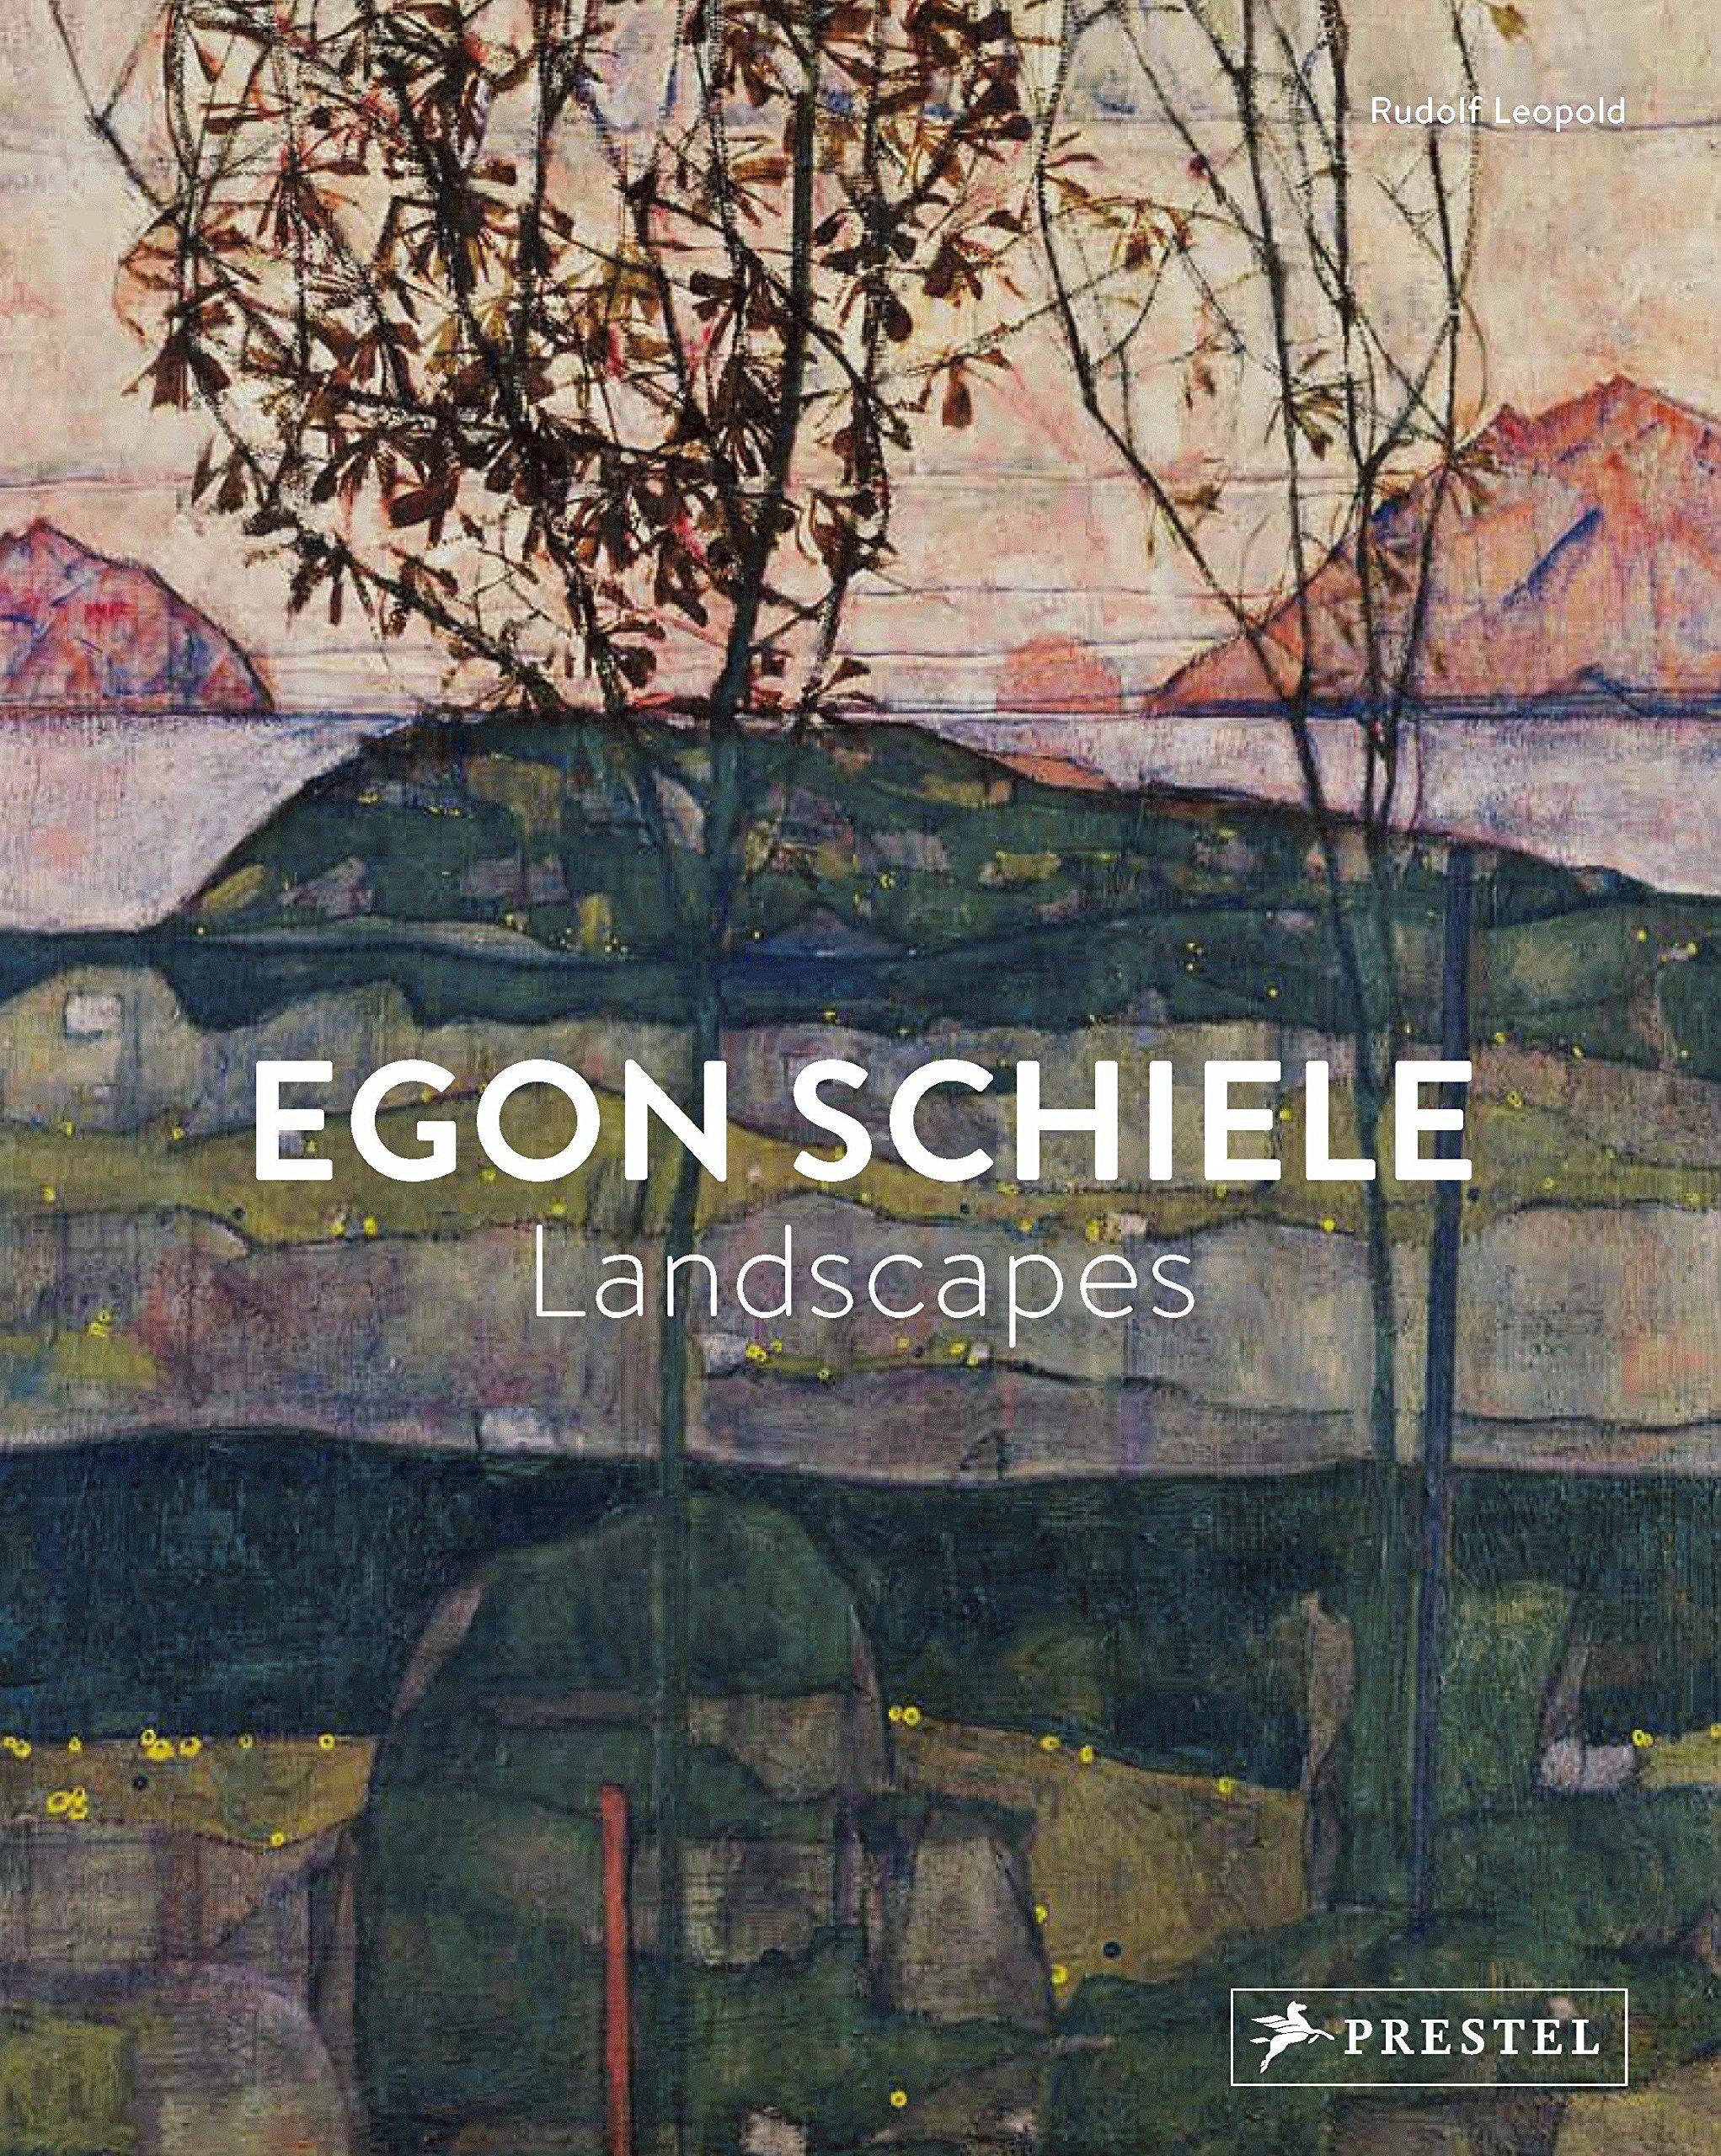 amazon egon schiele landscapes rudolf leopold surrealism